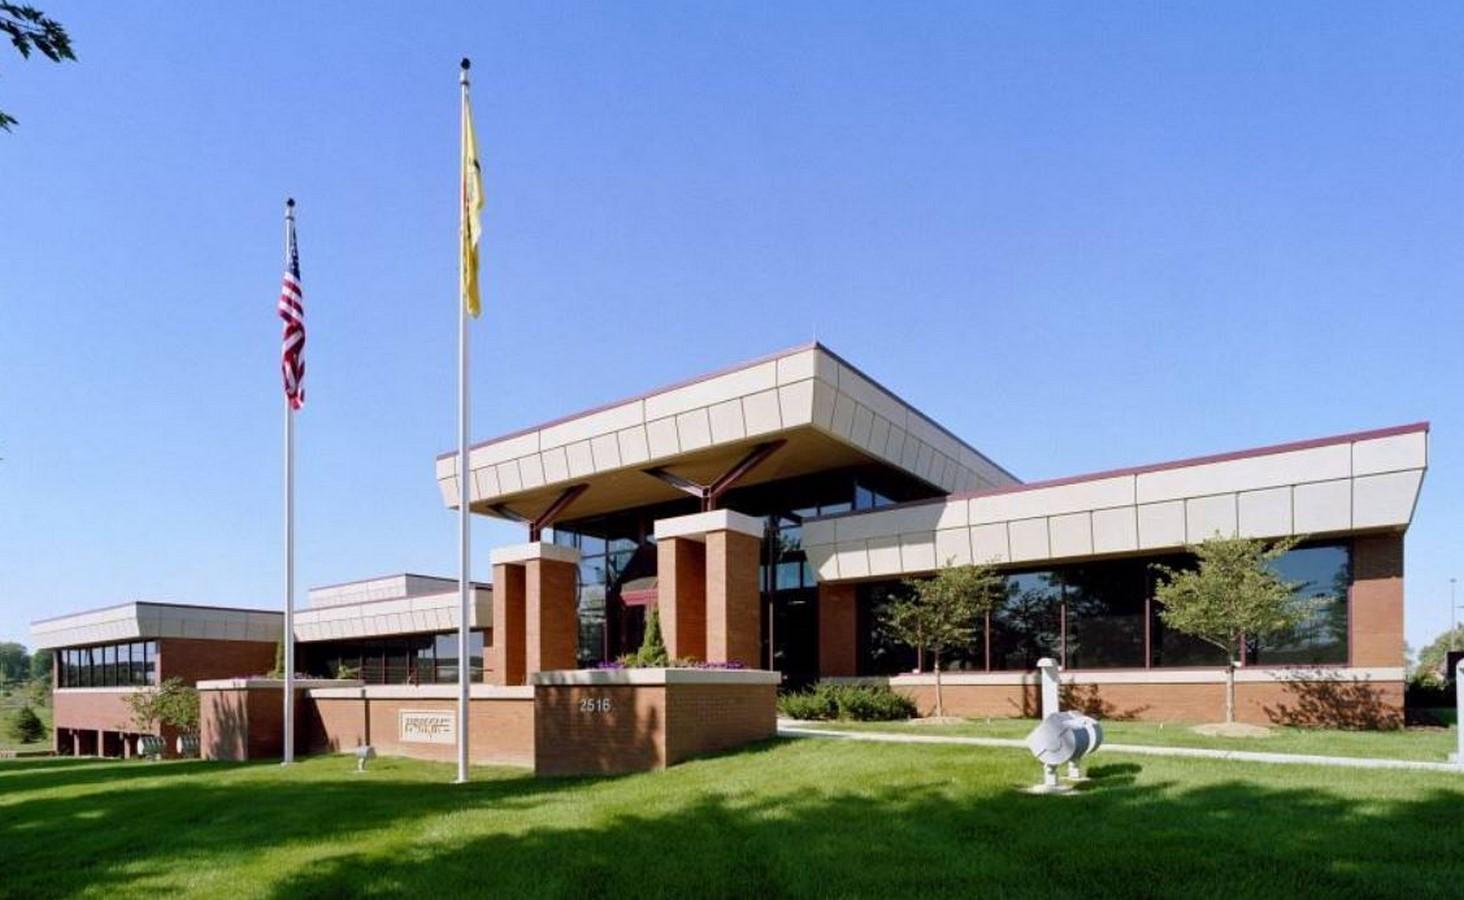 Architects in Omaha - Top 45 Architects in Omaha - Sheet37